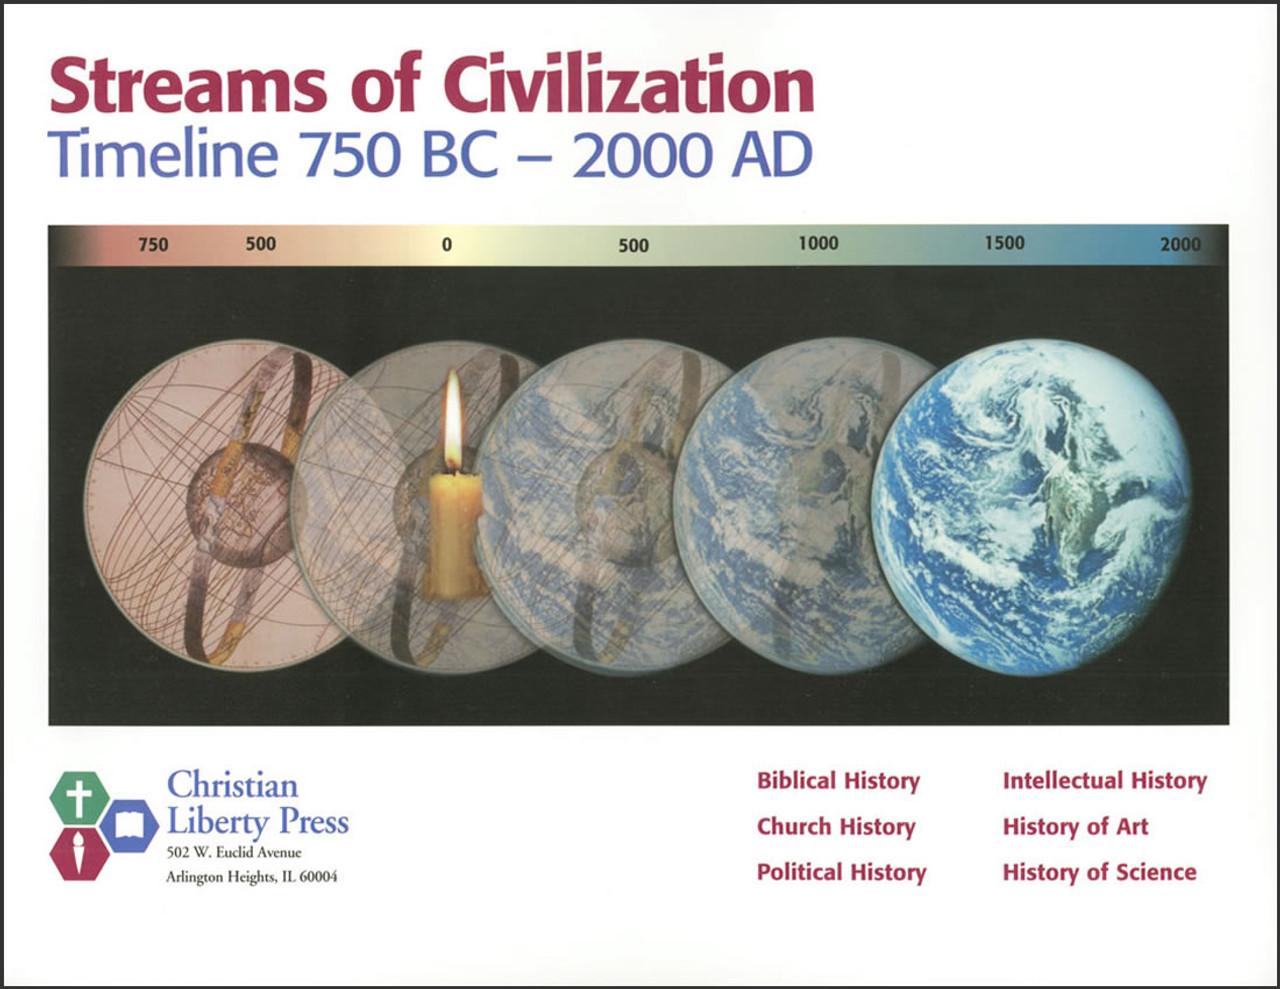 Streams of Civilization Timeline, 750 B.C. - 2000 A.D.